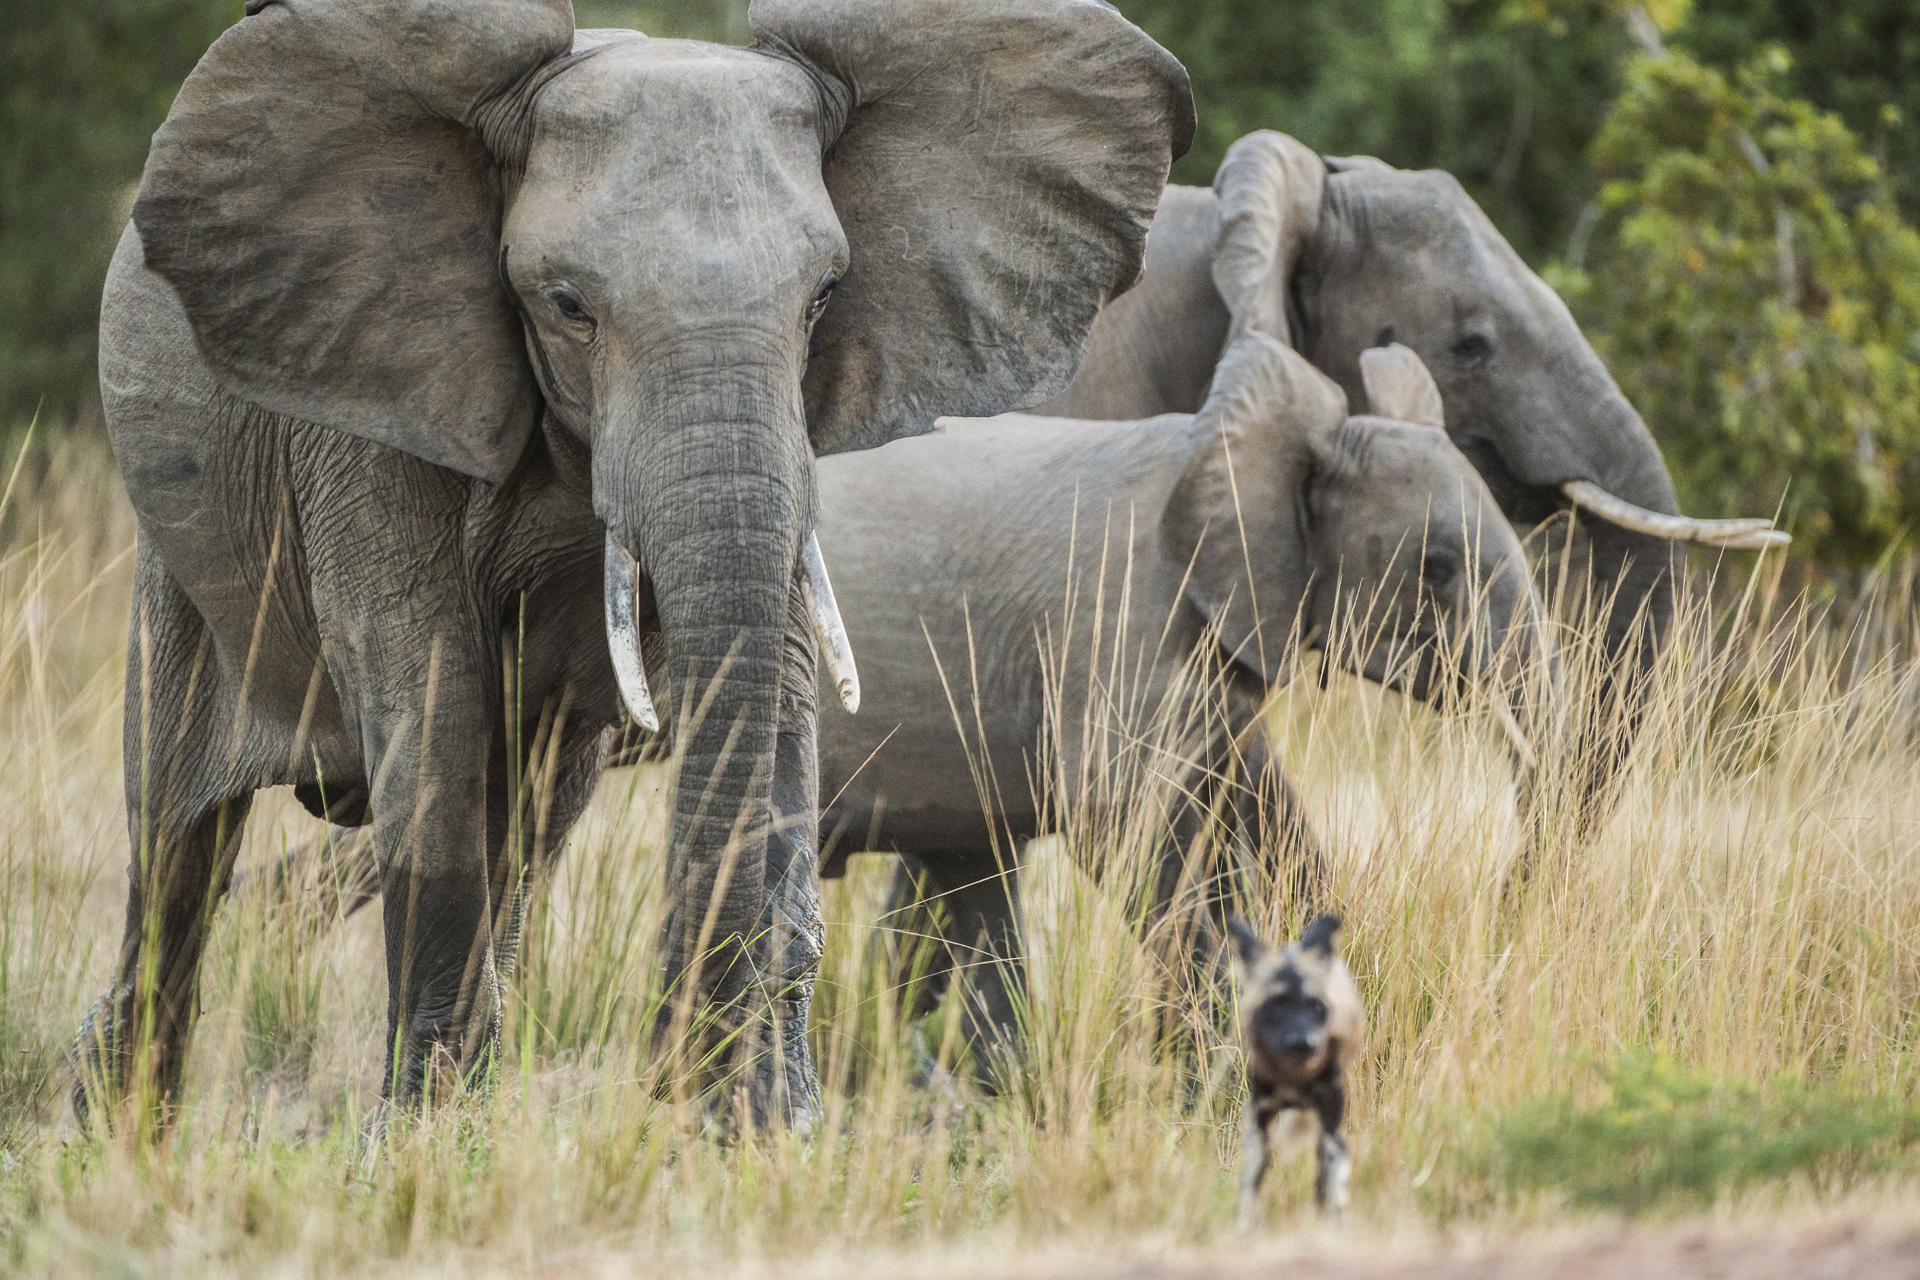 A wild dog runs from an elephant it had been teasing.